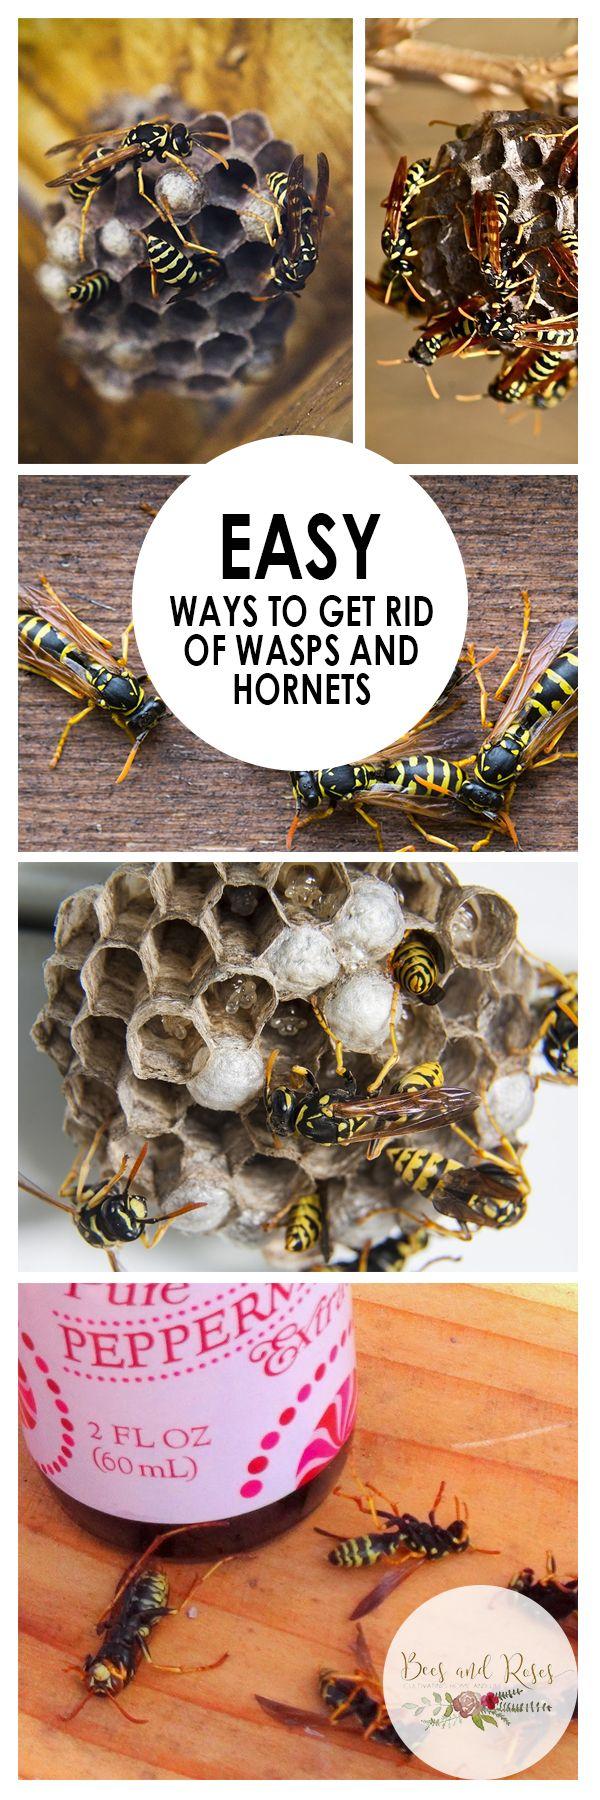 best 25 pest control ideas on pinterest natural bug killer